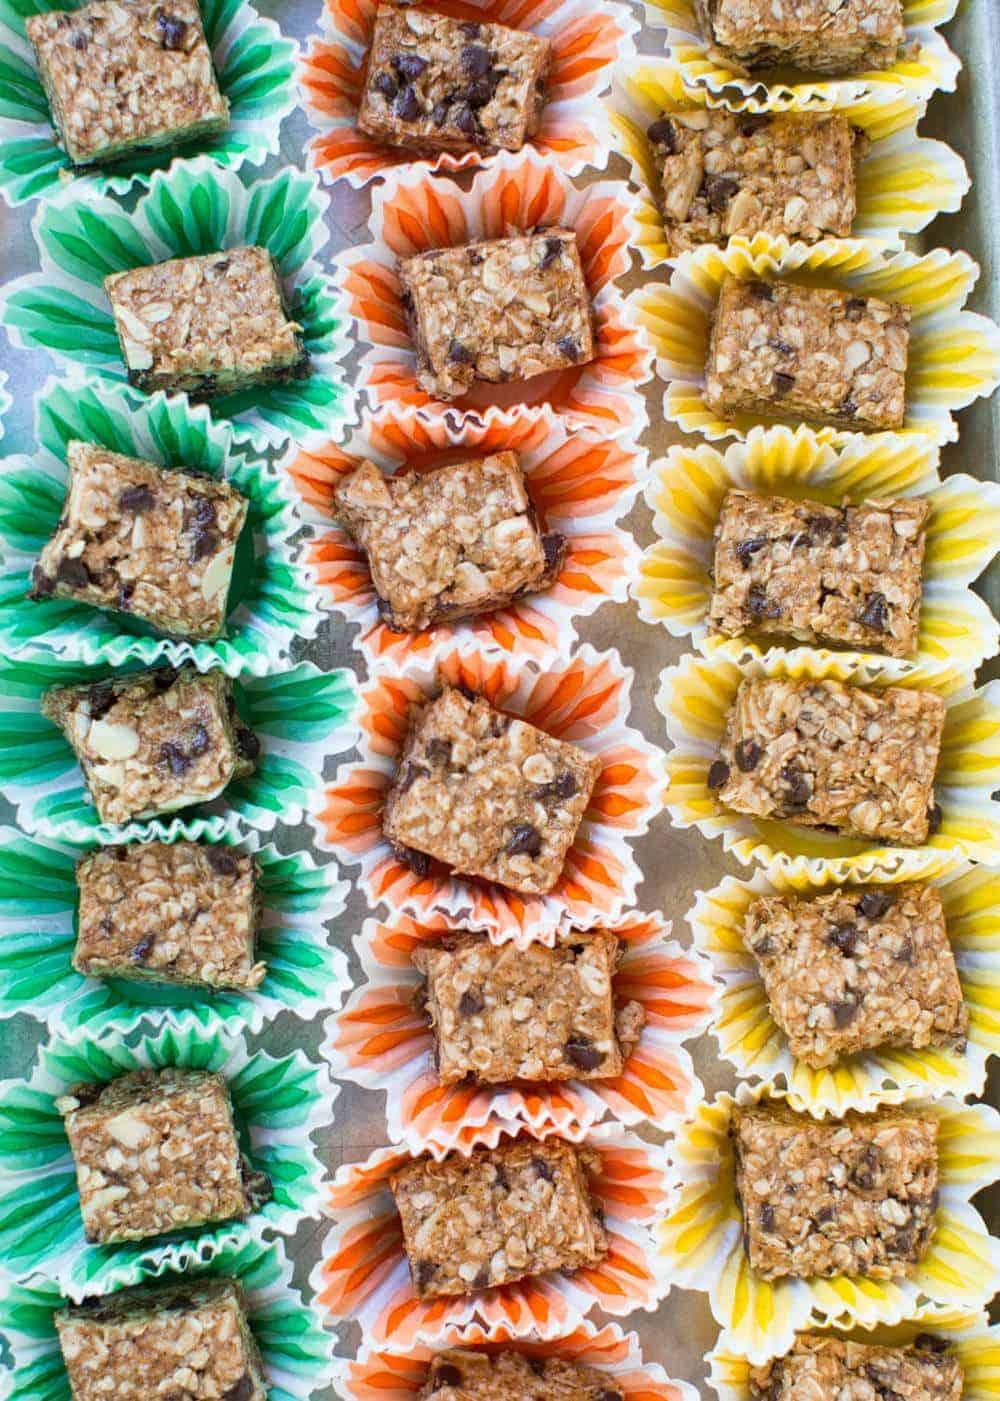 Best homemade granola bar recipe no bake i heart nap time homemade granola bars ccuart Image collections